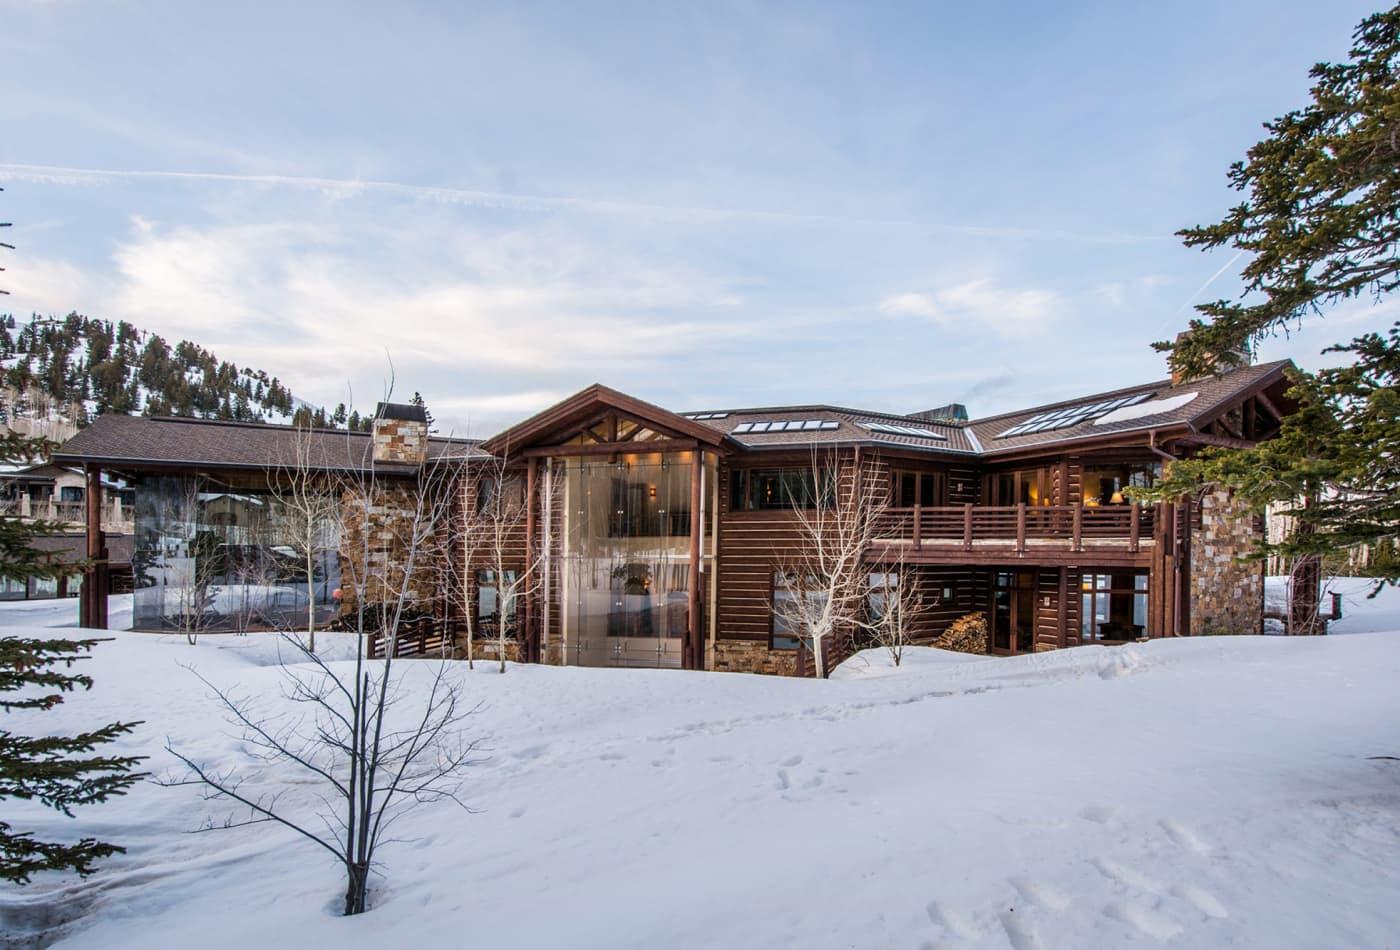 Park City ski lodge costs $10,000 a night